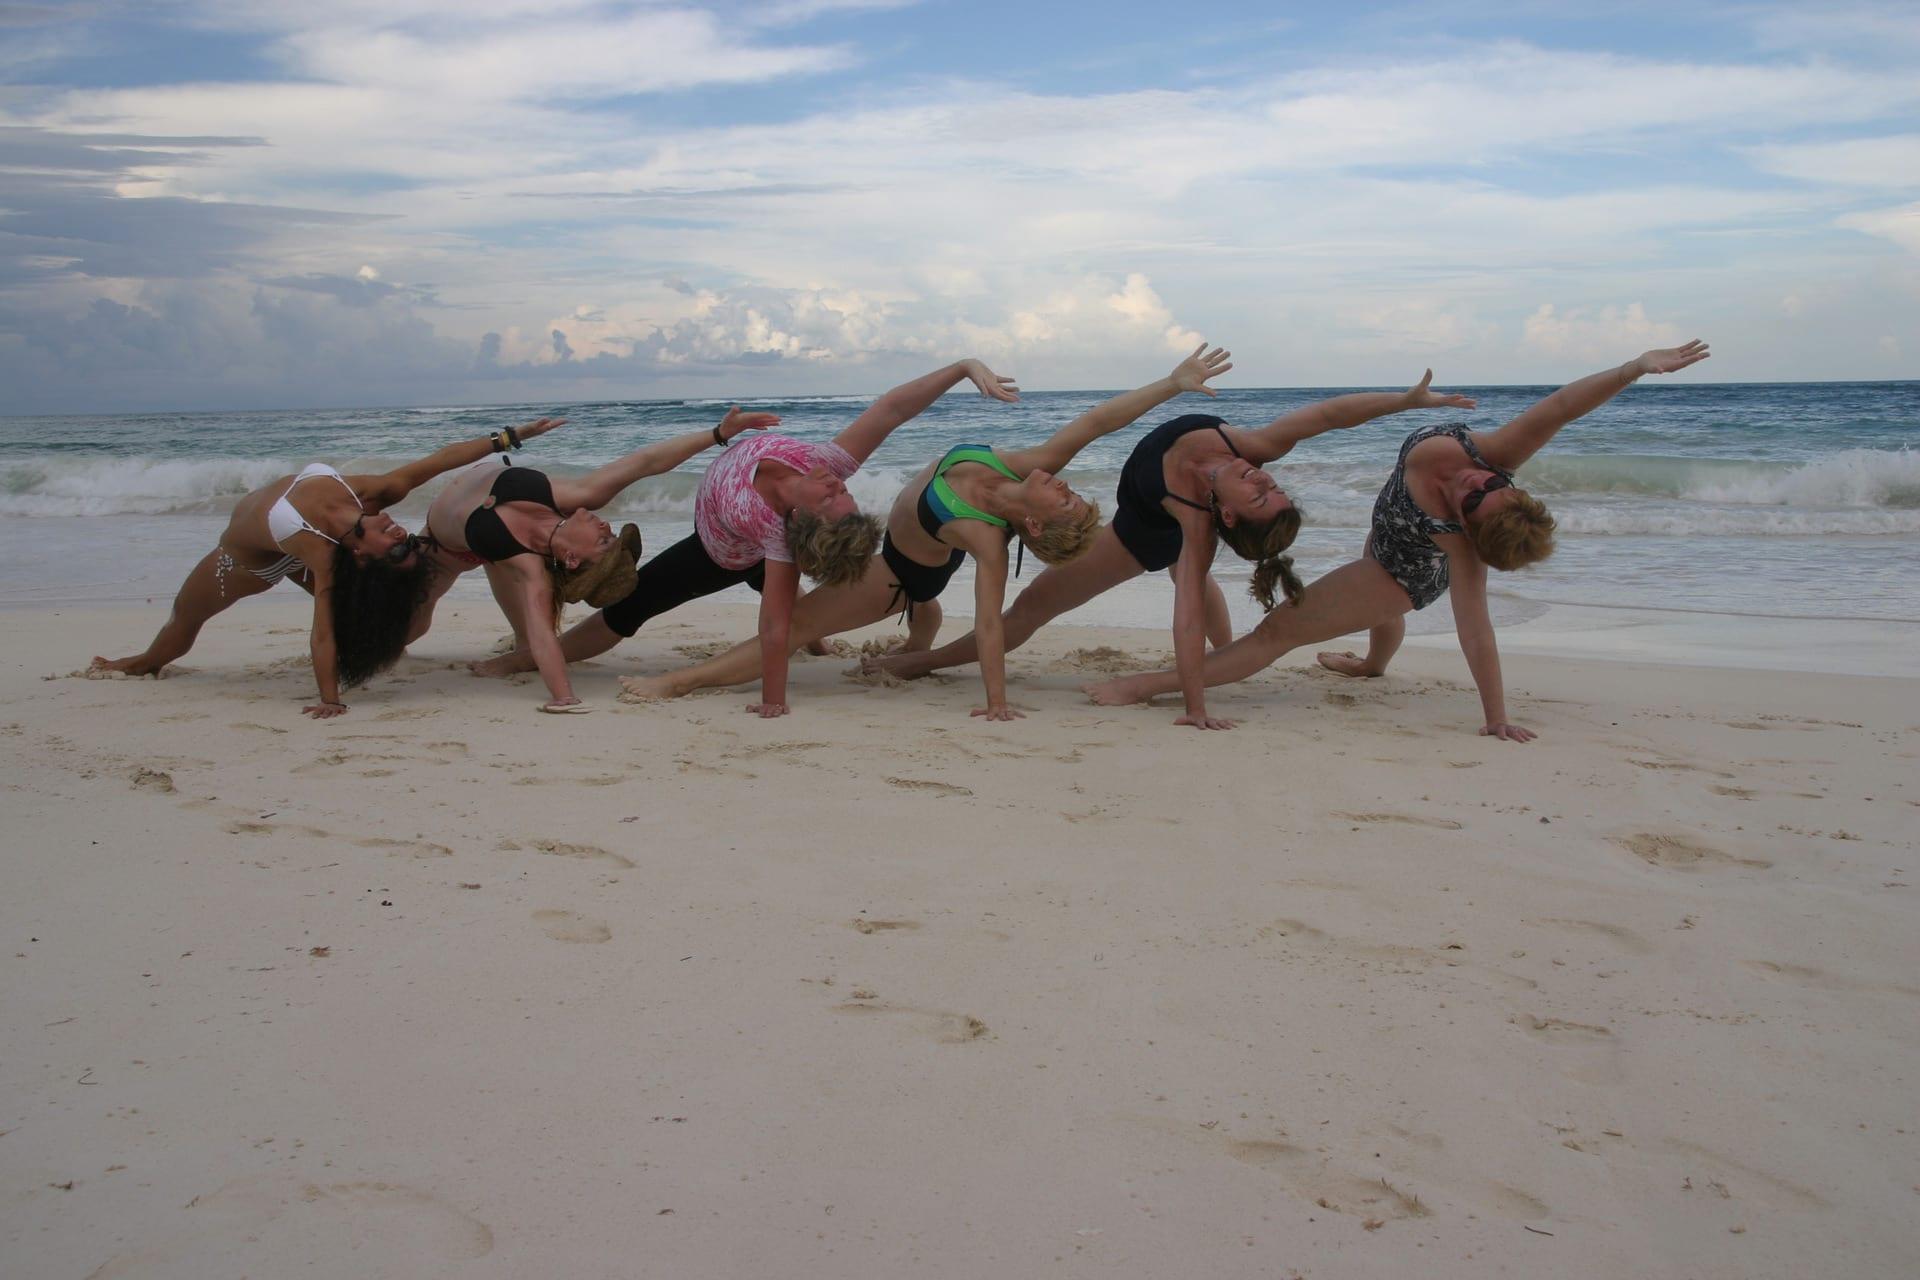 Group yoga on the beach in tulum